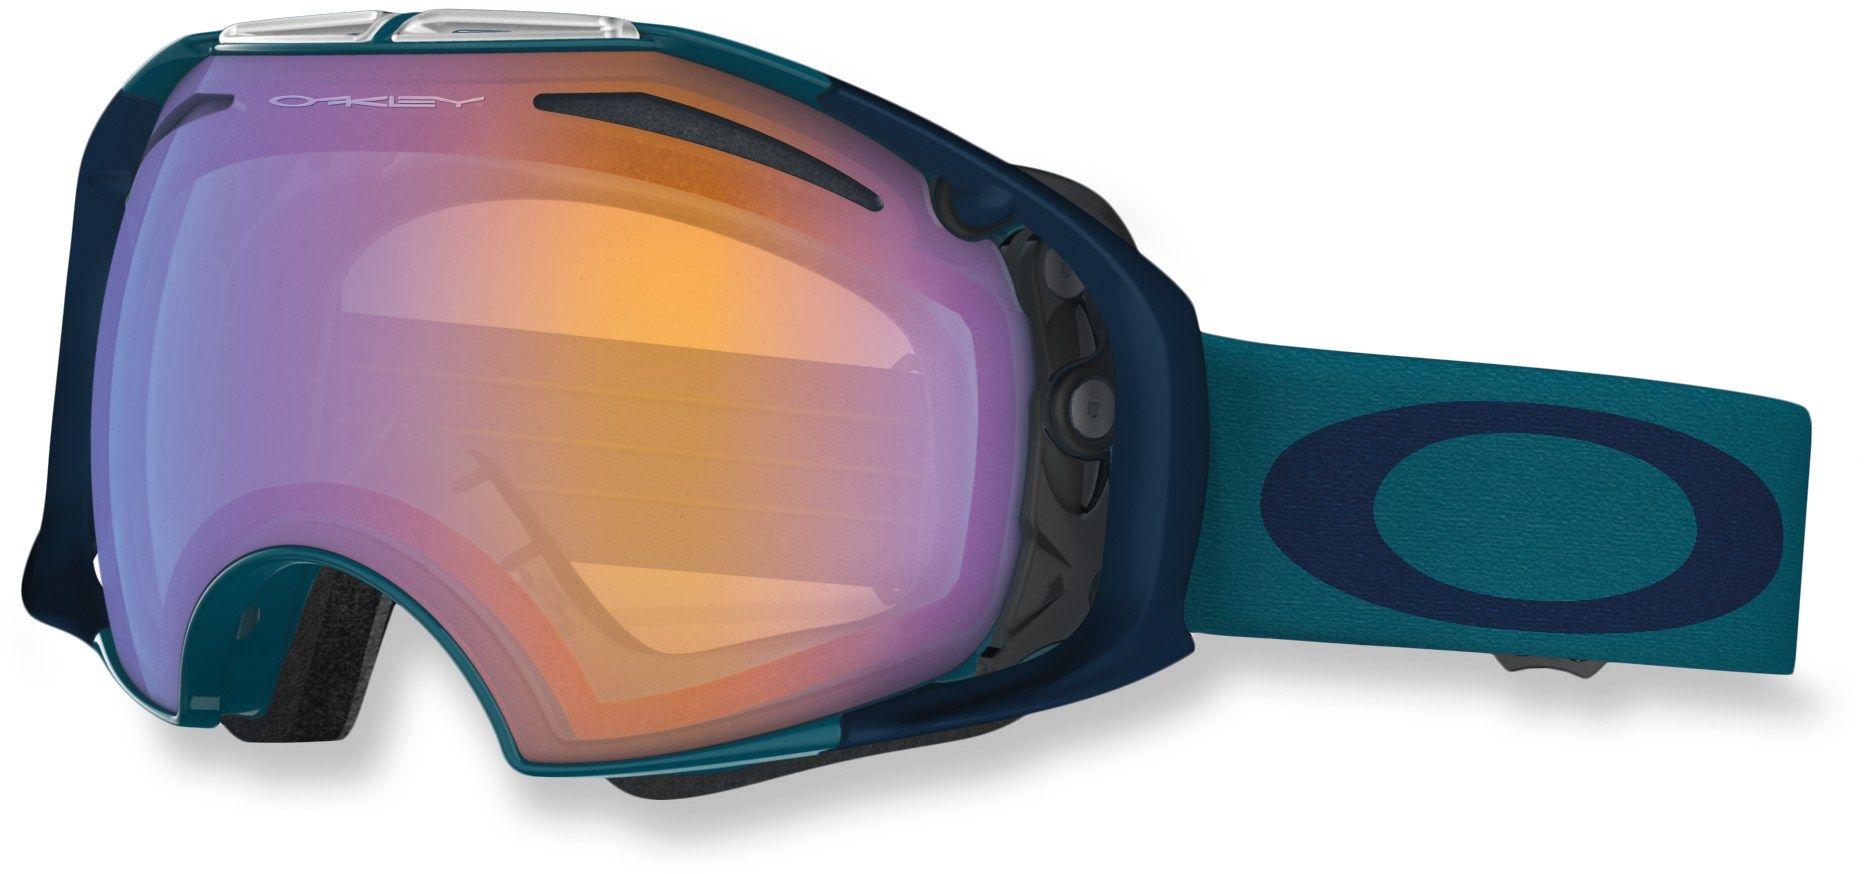 184331c6aa3 Oakley Airbrake Snow Goggles - Men s